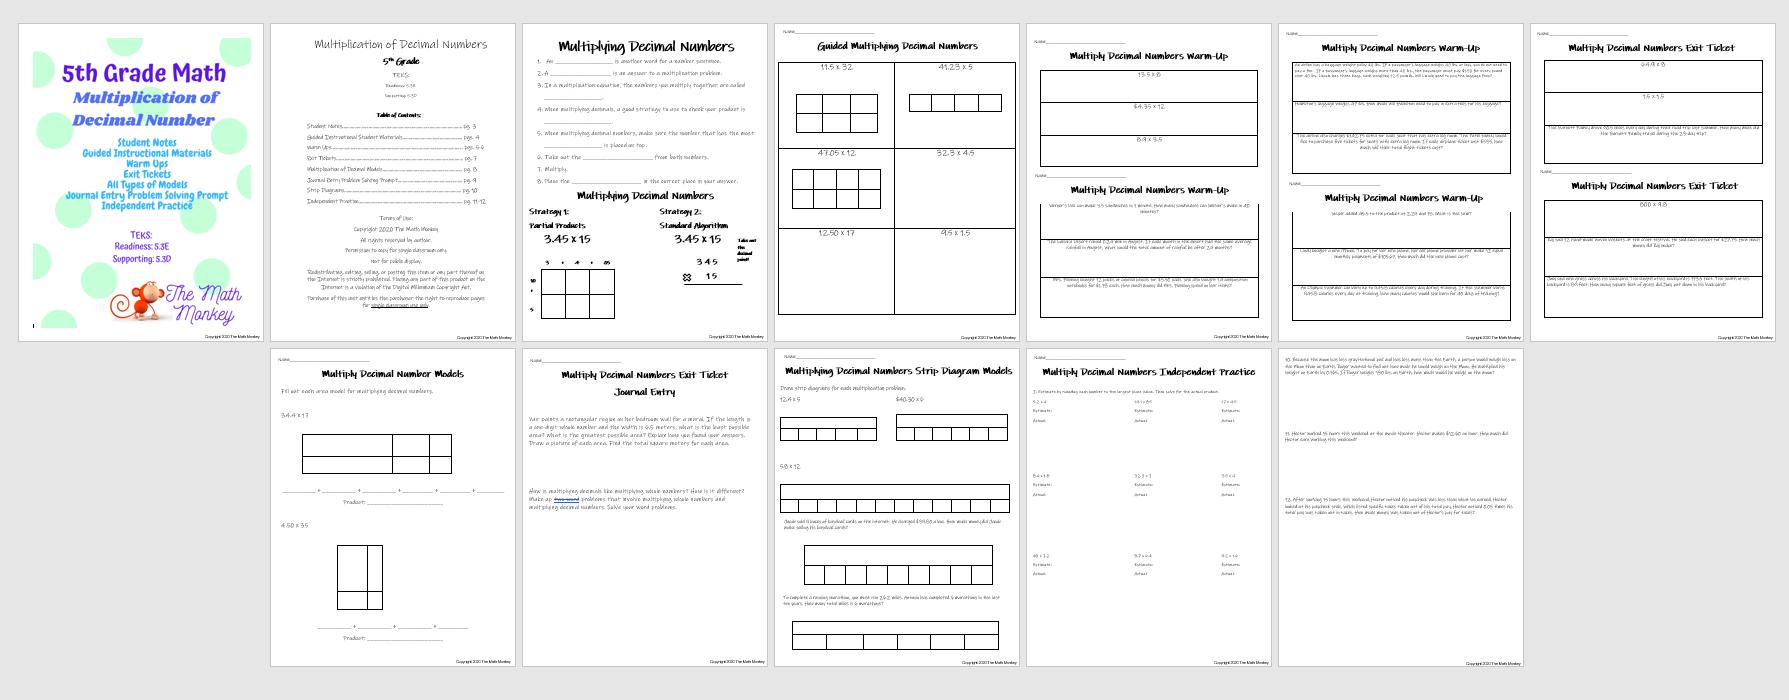 5th Grade Math Multiplication of Decimal Numbers 5.3D, 5